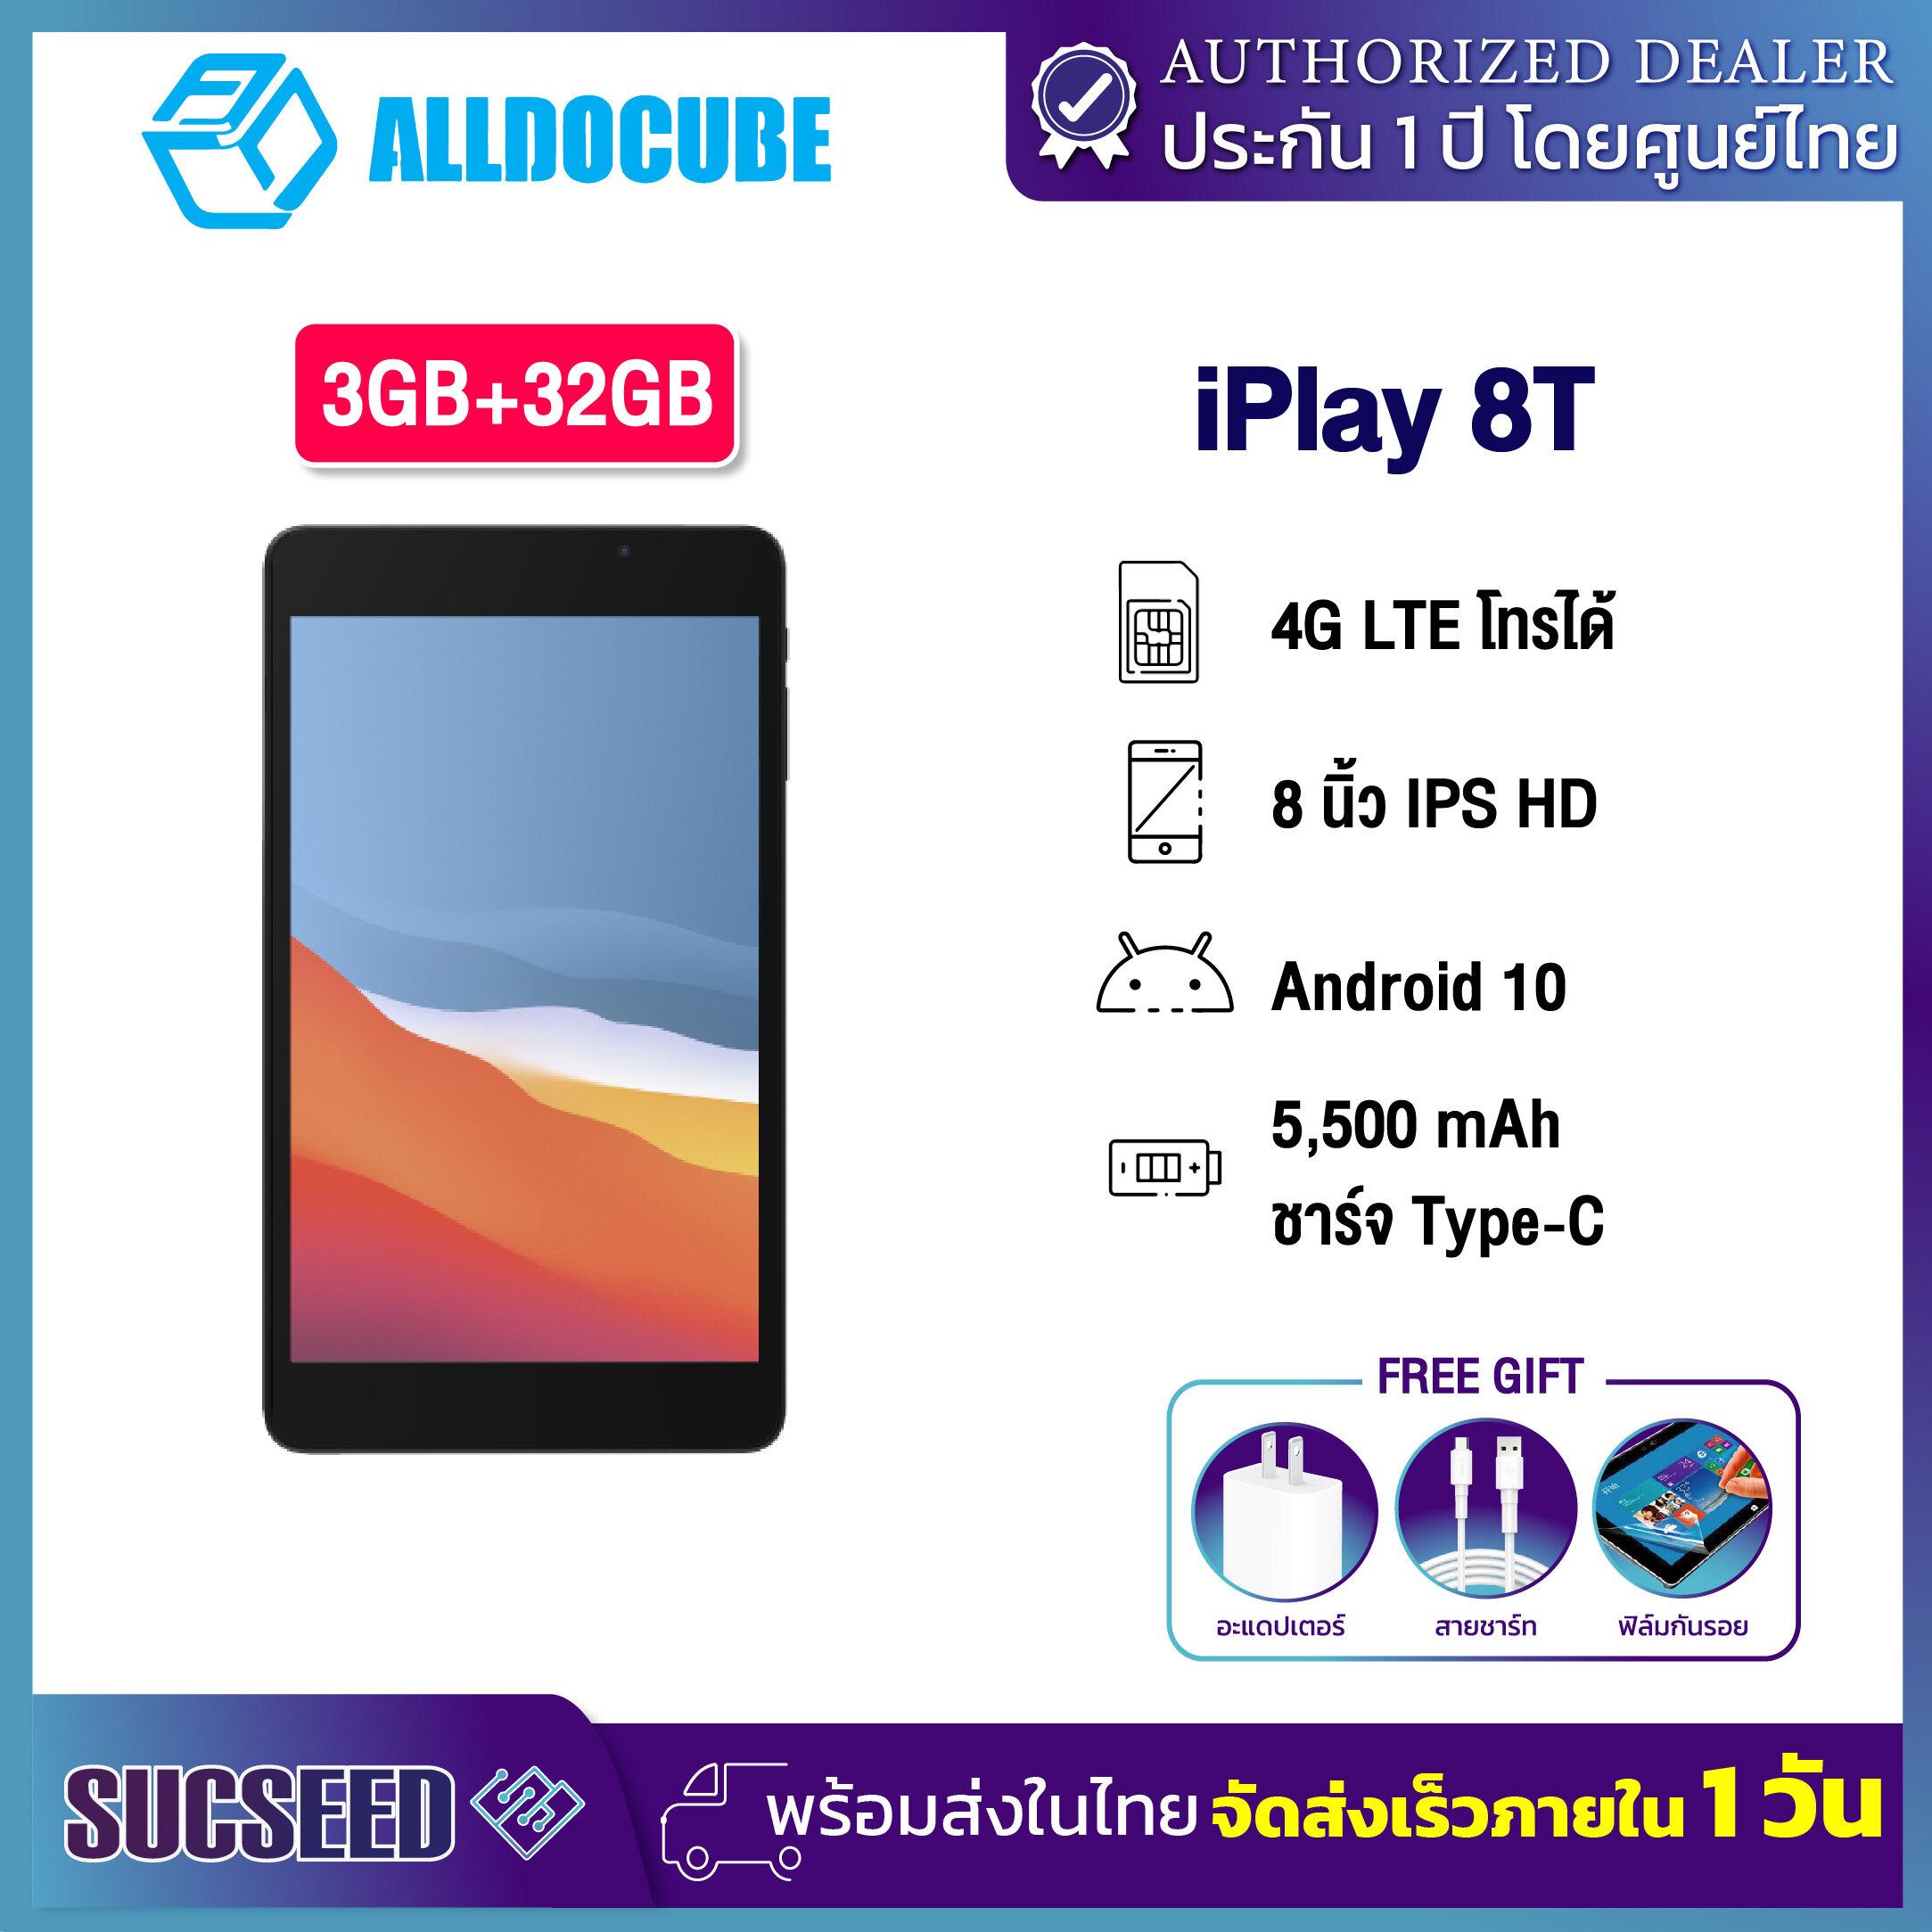 Alldocube iplay 8T (T802) จอ 8 นิ้ว IPS ใส่ซิม โทรได้ 4G LTE Android10 3/32GB SC9832E AI Quad Core GPS BT 5500mAh Type-C ออกบิลใบกำกับภาษี/ประกันศูนย์ไทย 1 ปี